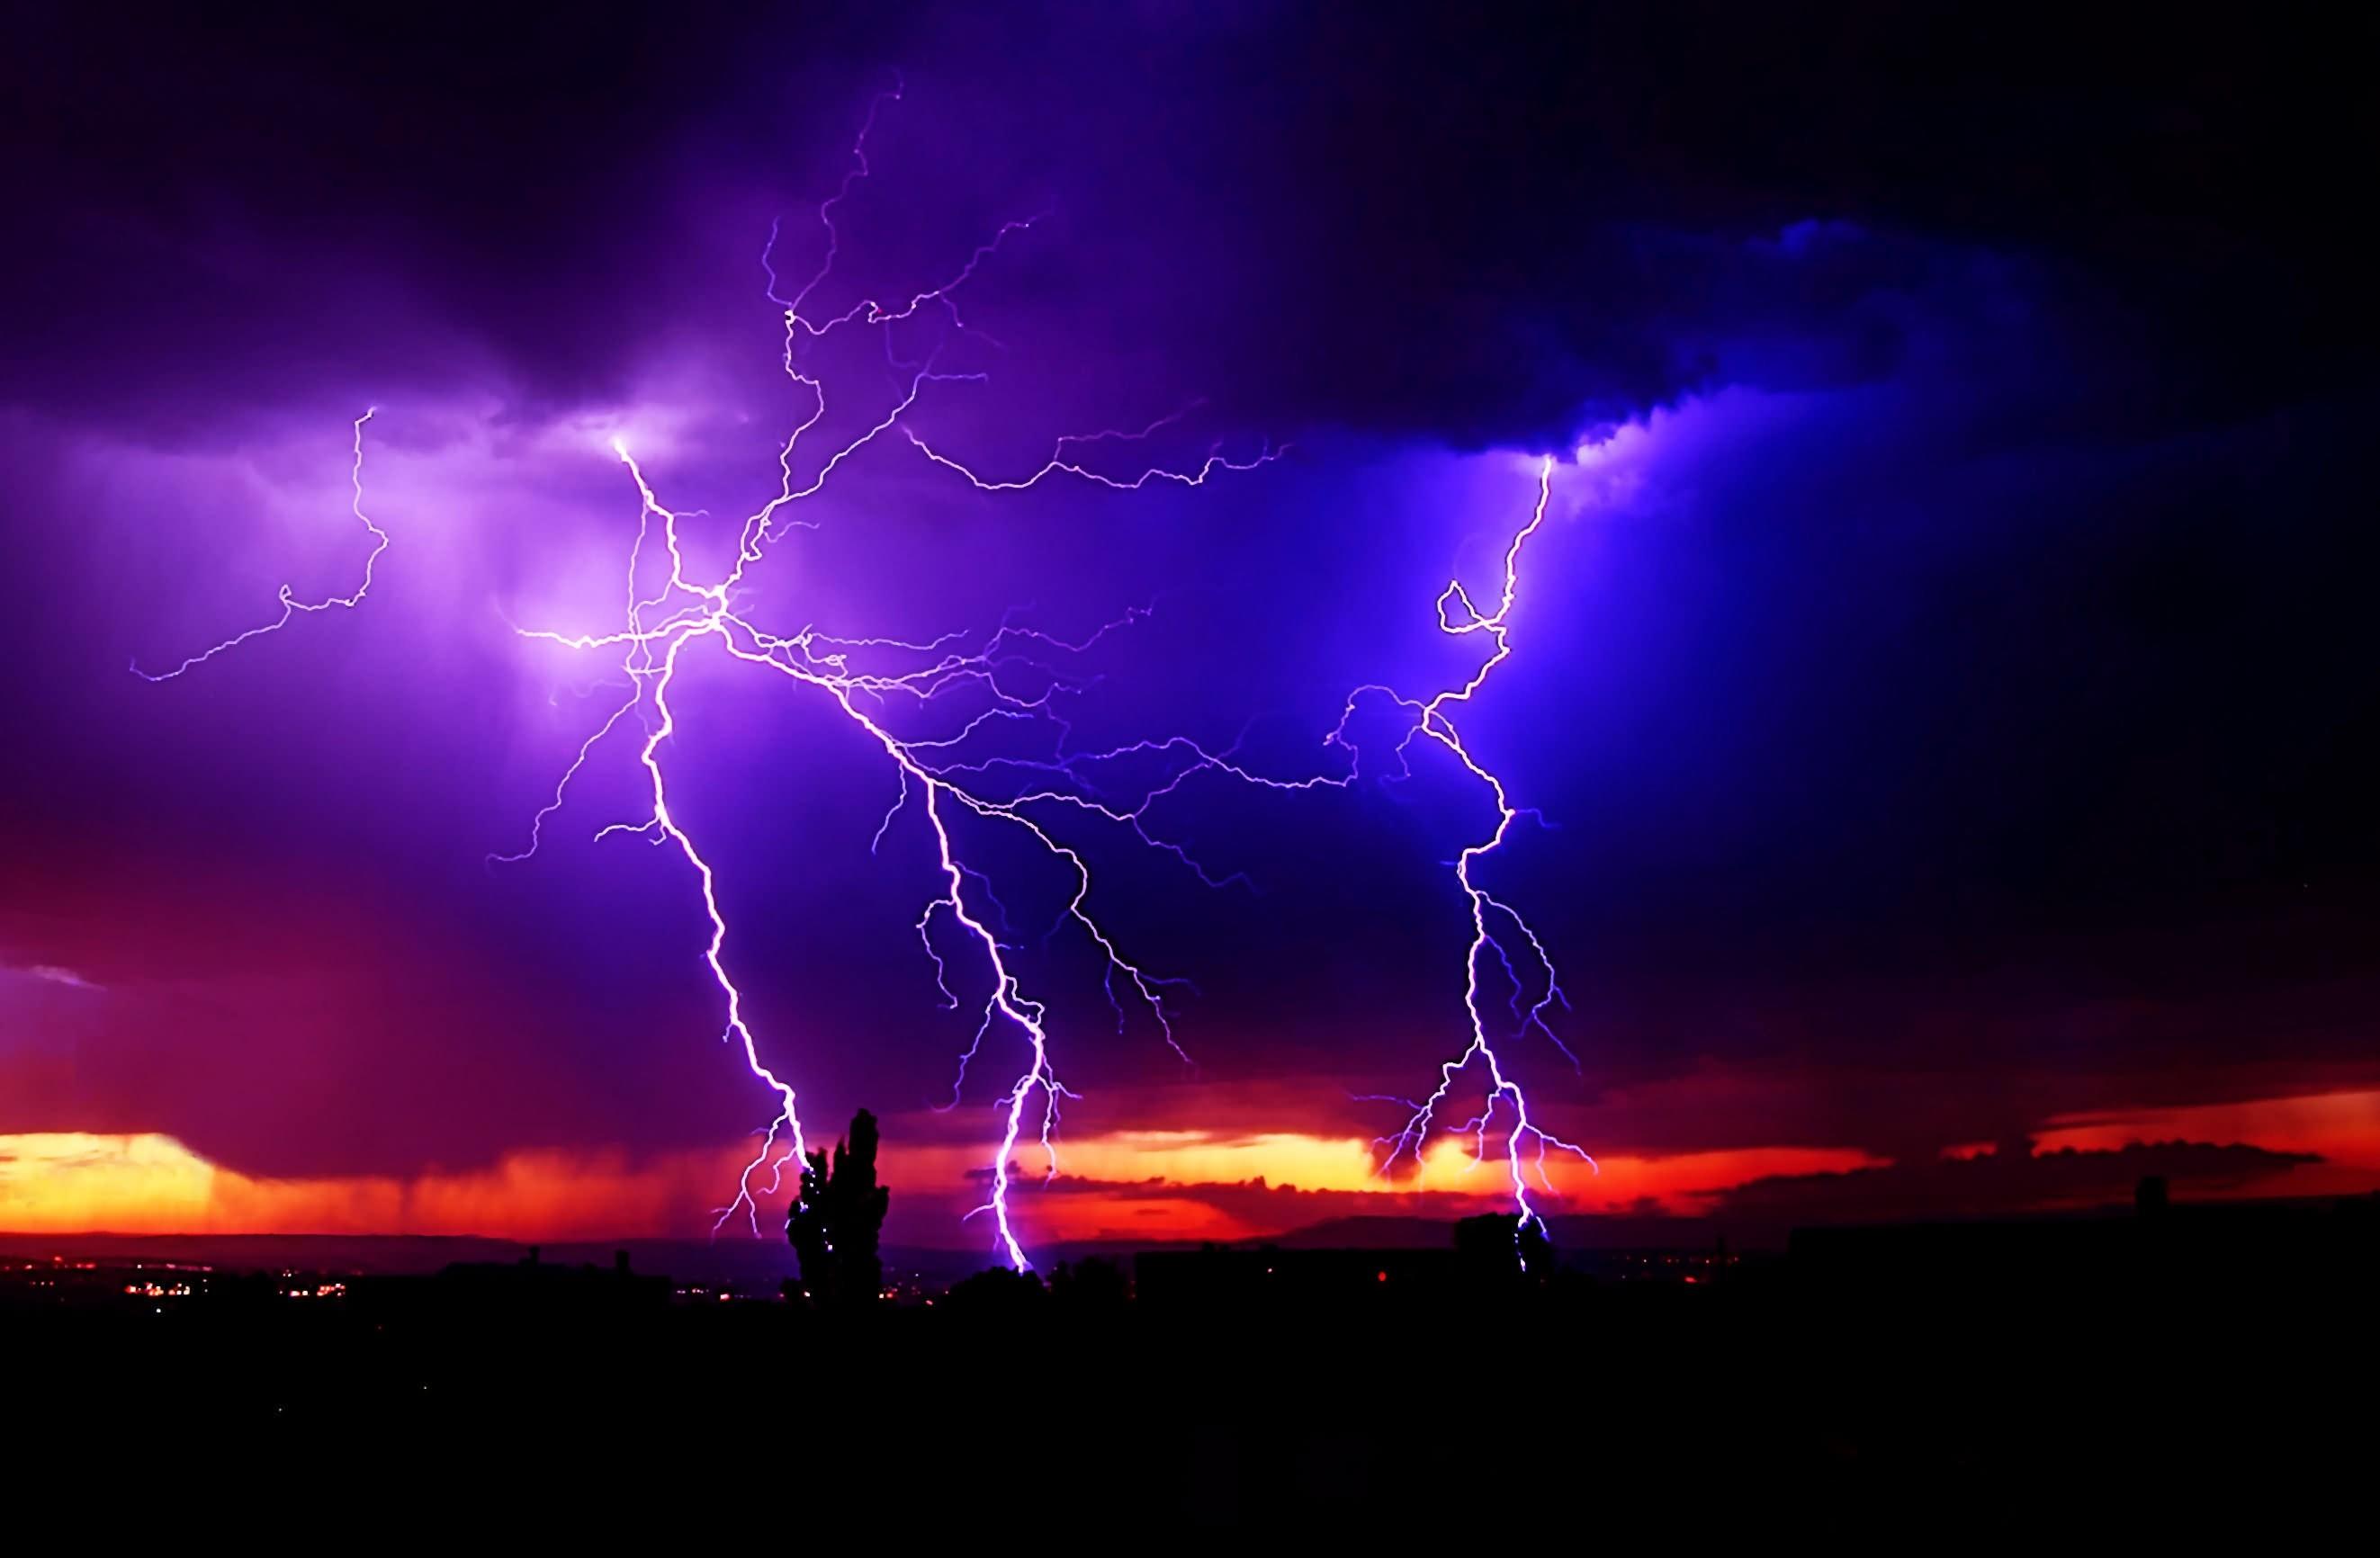 Res: 2645x1732, Index of /wallpaper/lightning